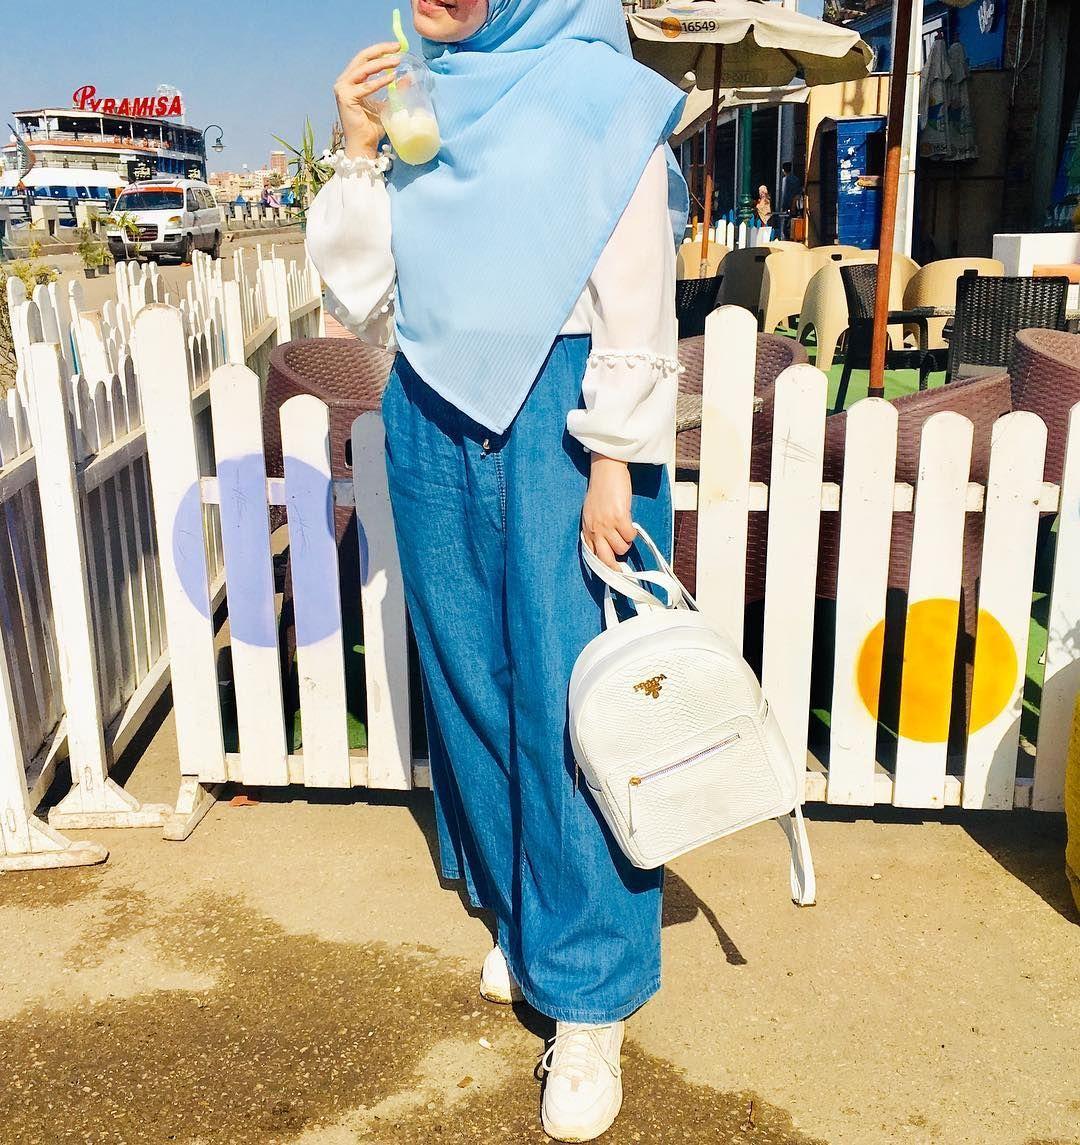 3 973 Likes 65 Comments S A L M A Salma Magdy965 On Instagram مساكم راحة بال راحة البال ن Muslim Fashion Dress Modest Fashion Hijab Modest Fashion